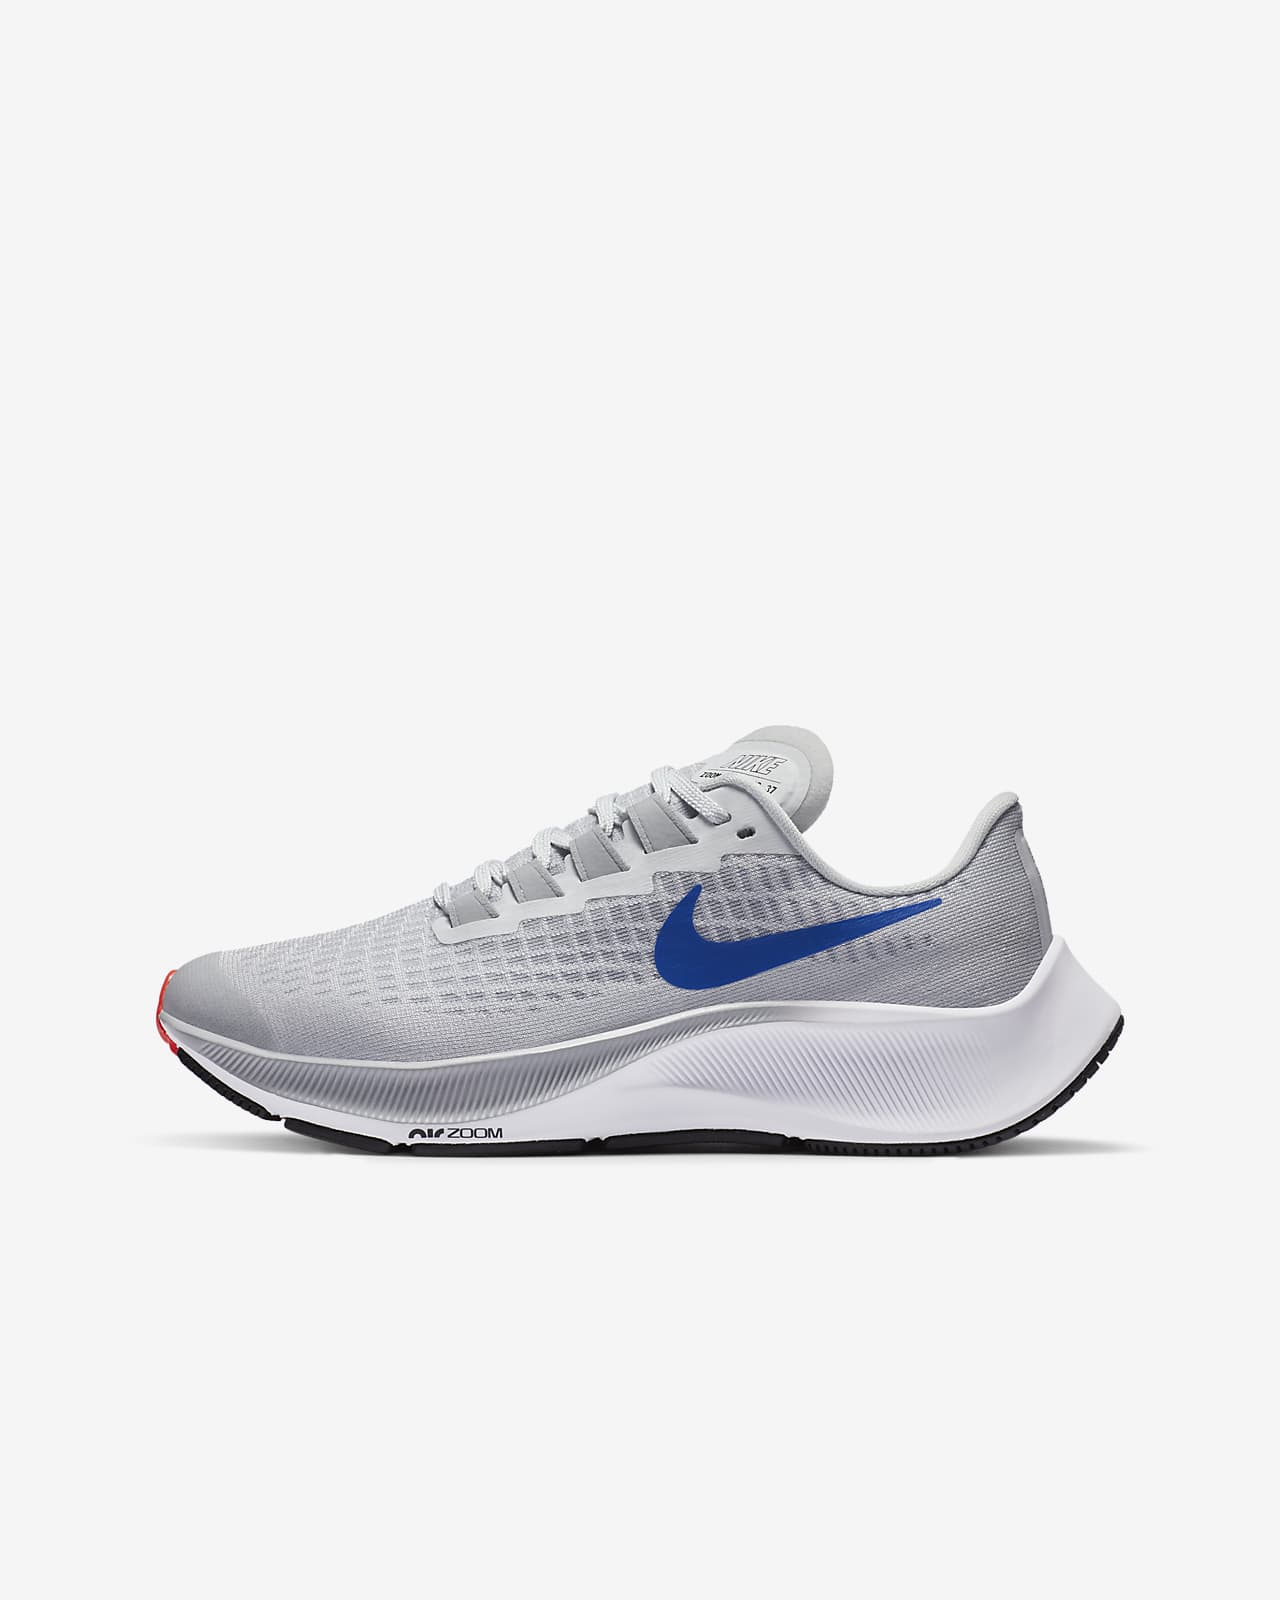 Calzado de running para niño talla grande Nike Air Zoom Pegasus 37